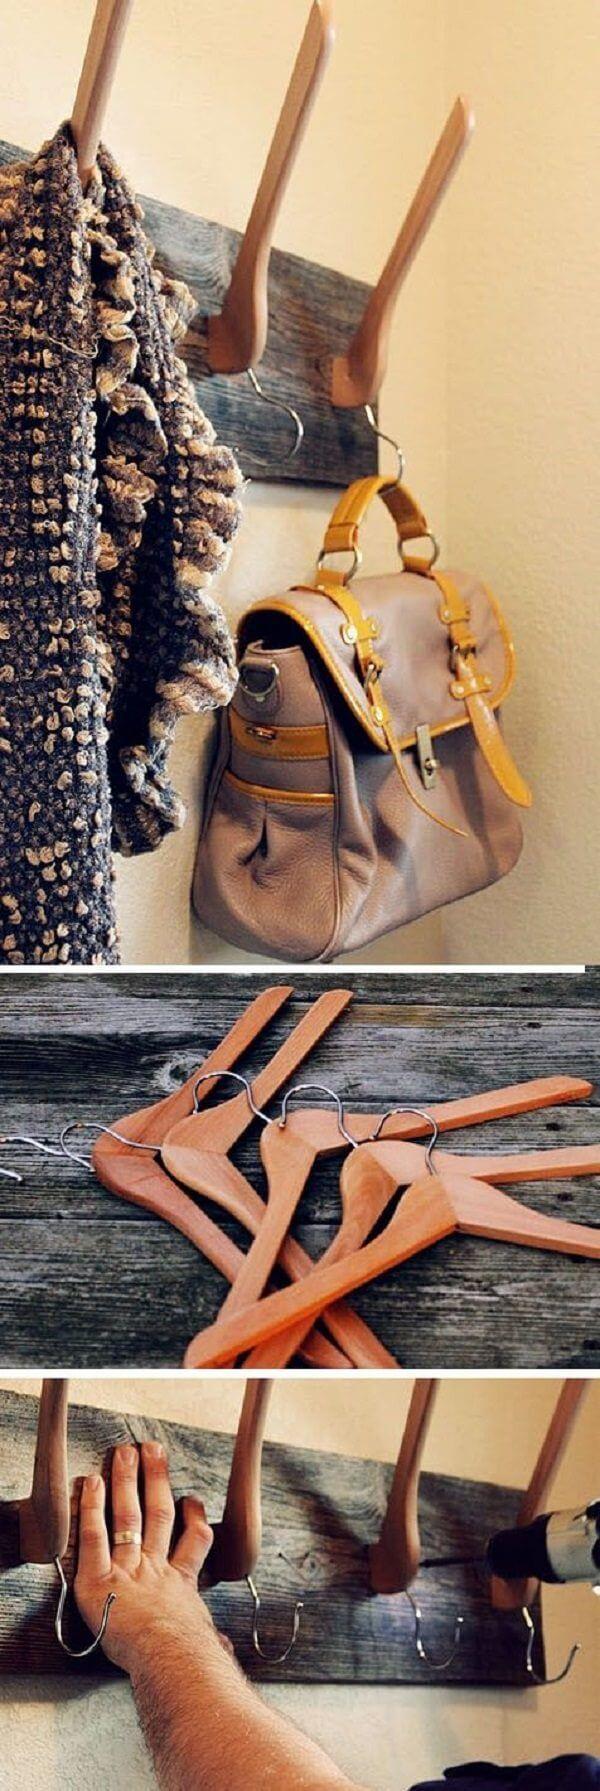 How to Dress Up Plain Wood Hangers